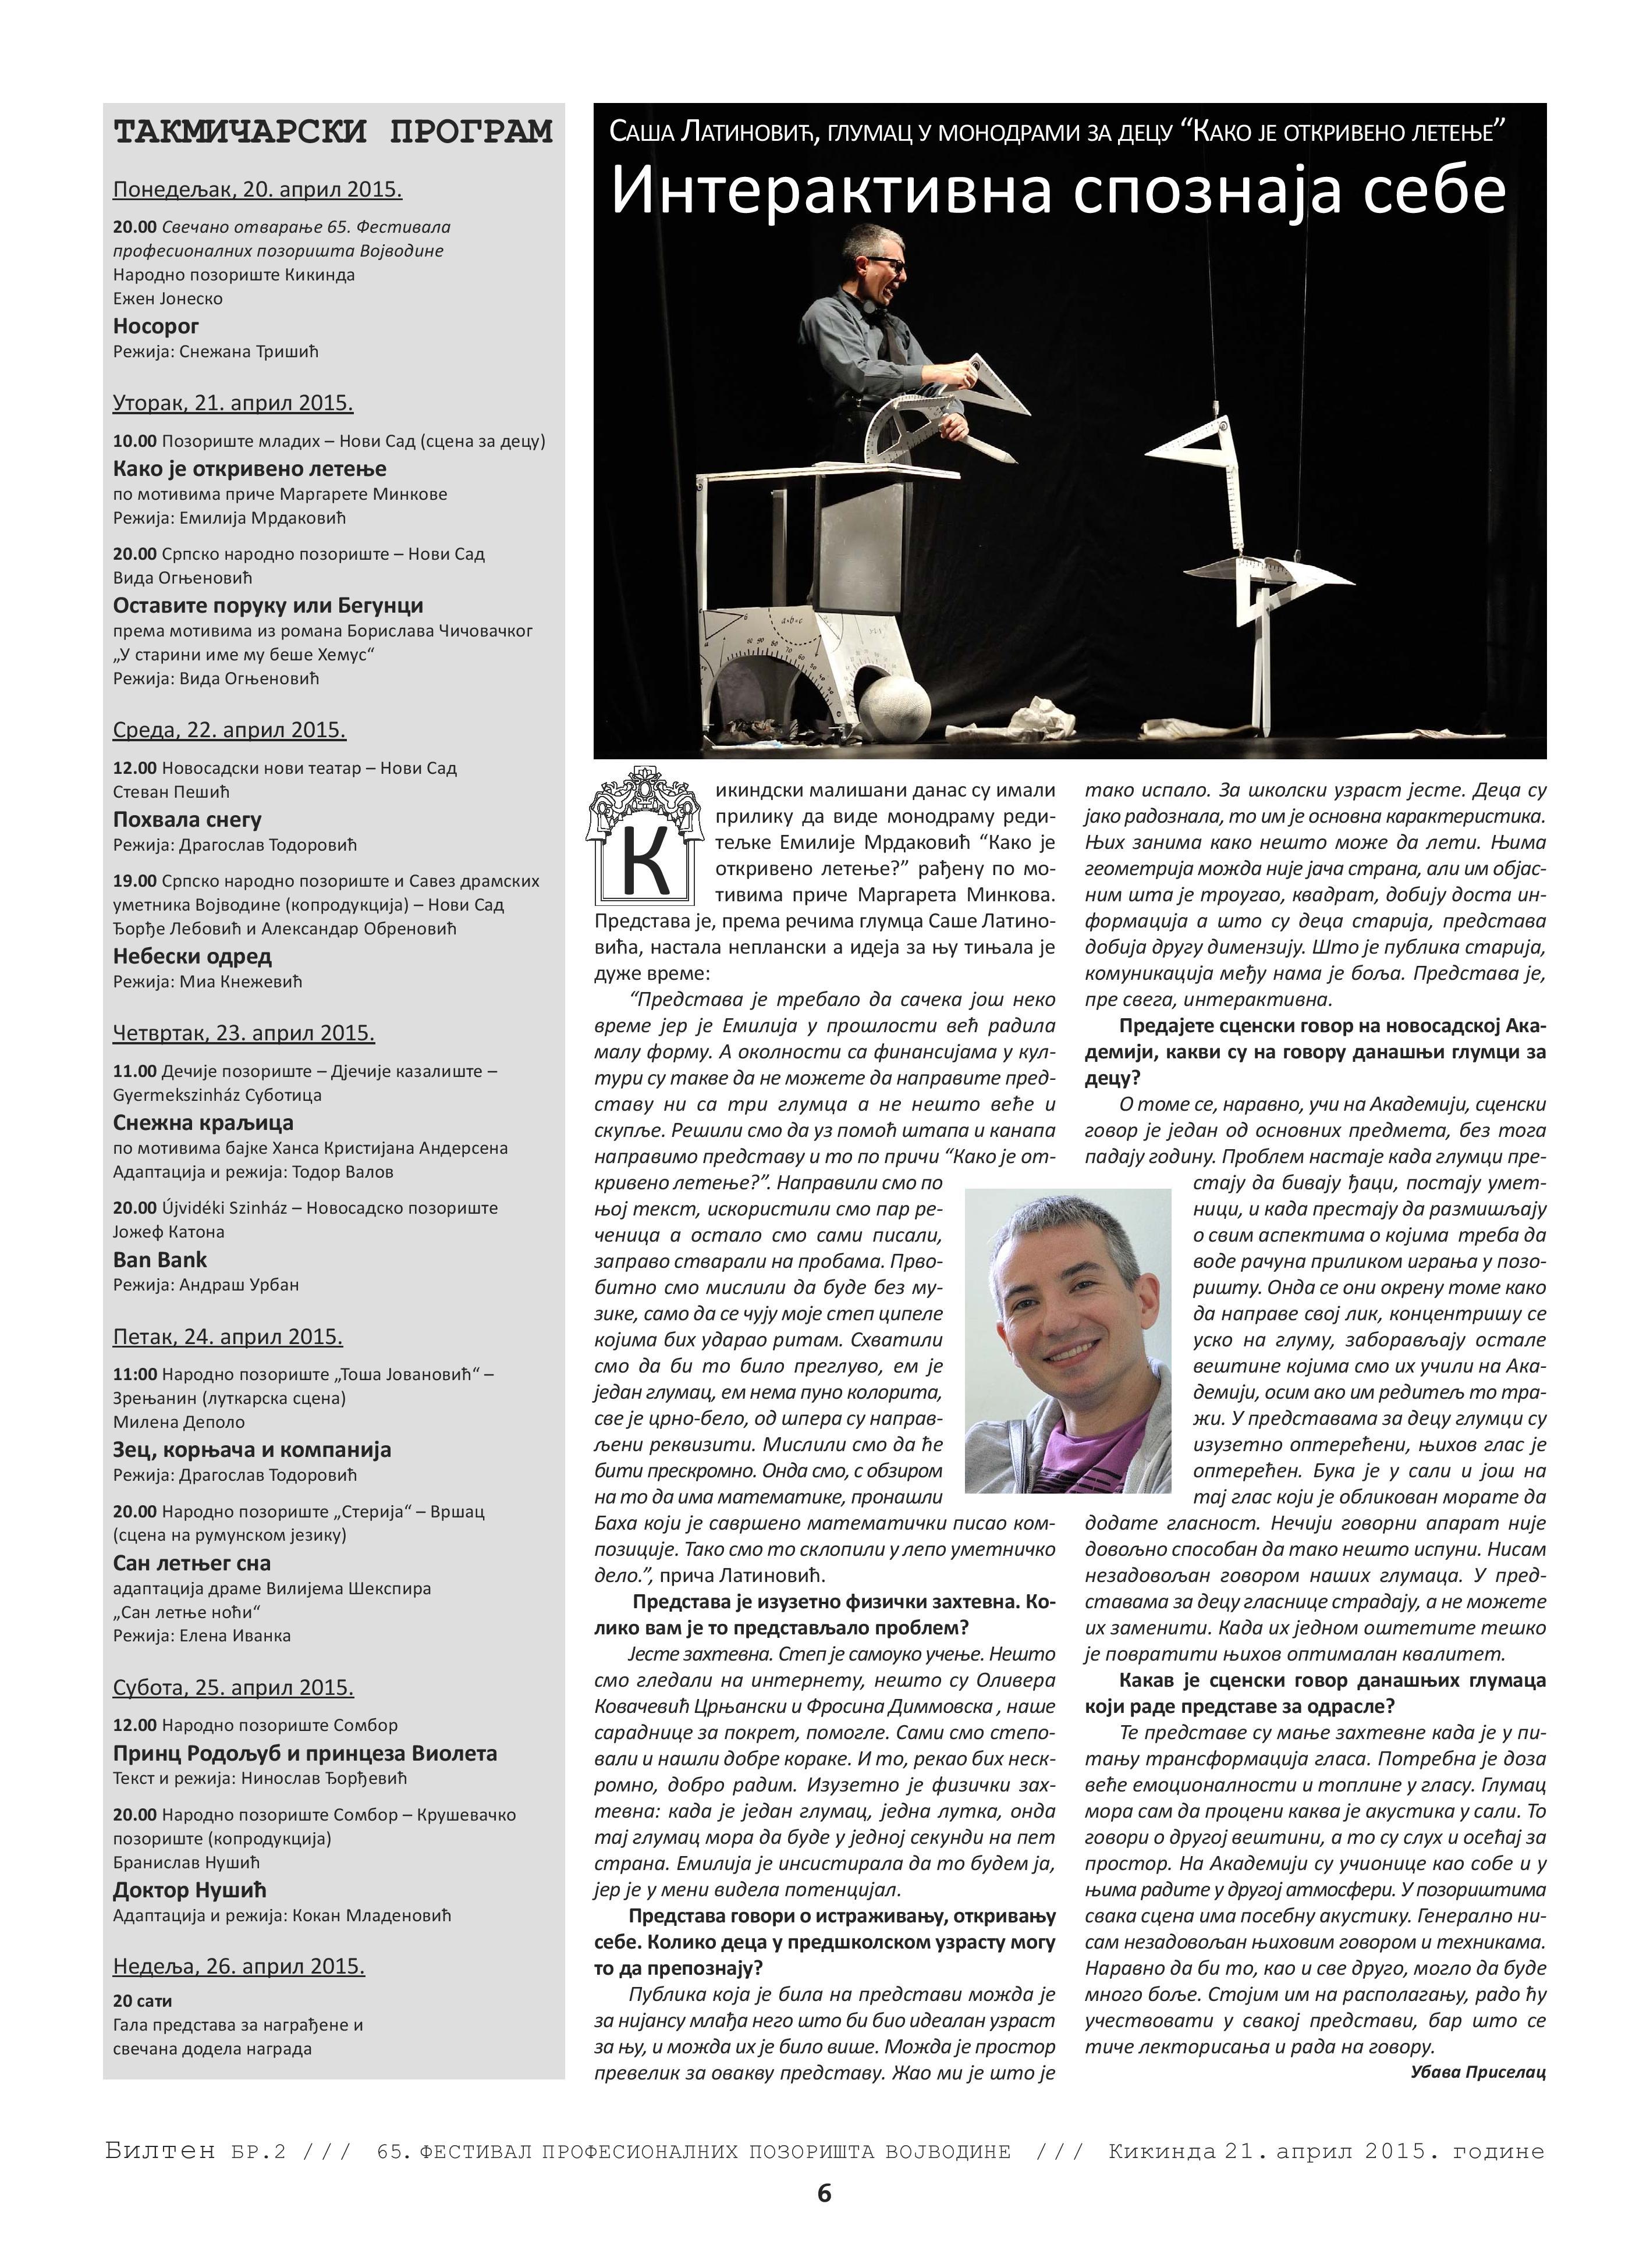 BILTEN_02_21 april-page-006